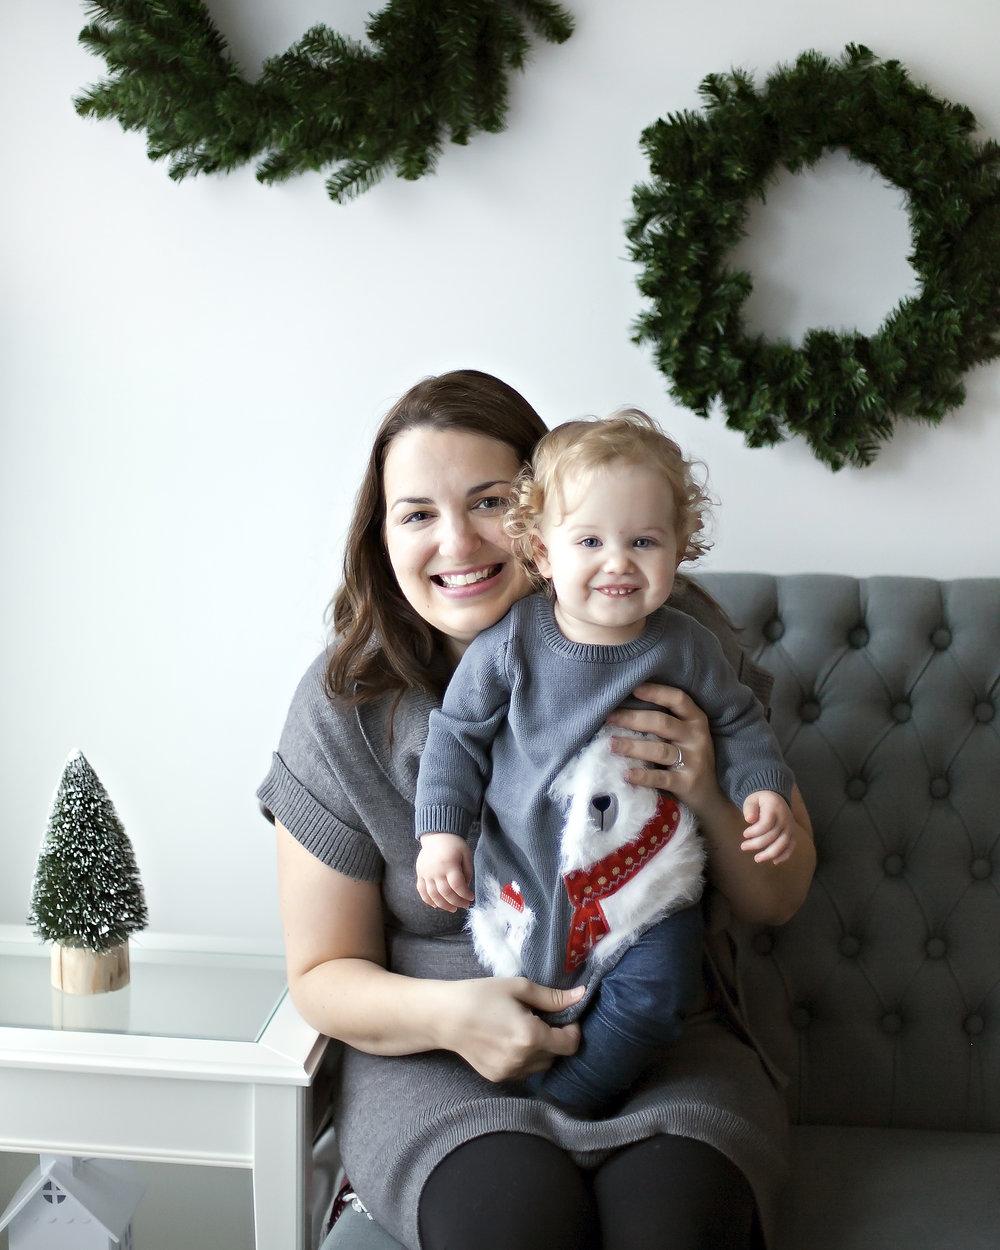 Mother_Daughter_Christmas_Photograph_Petra_King_Photography